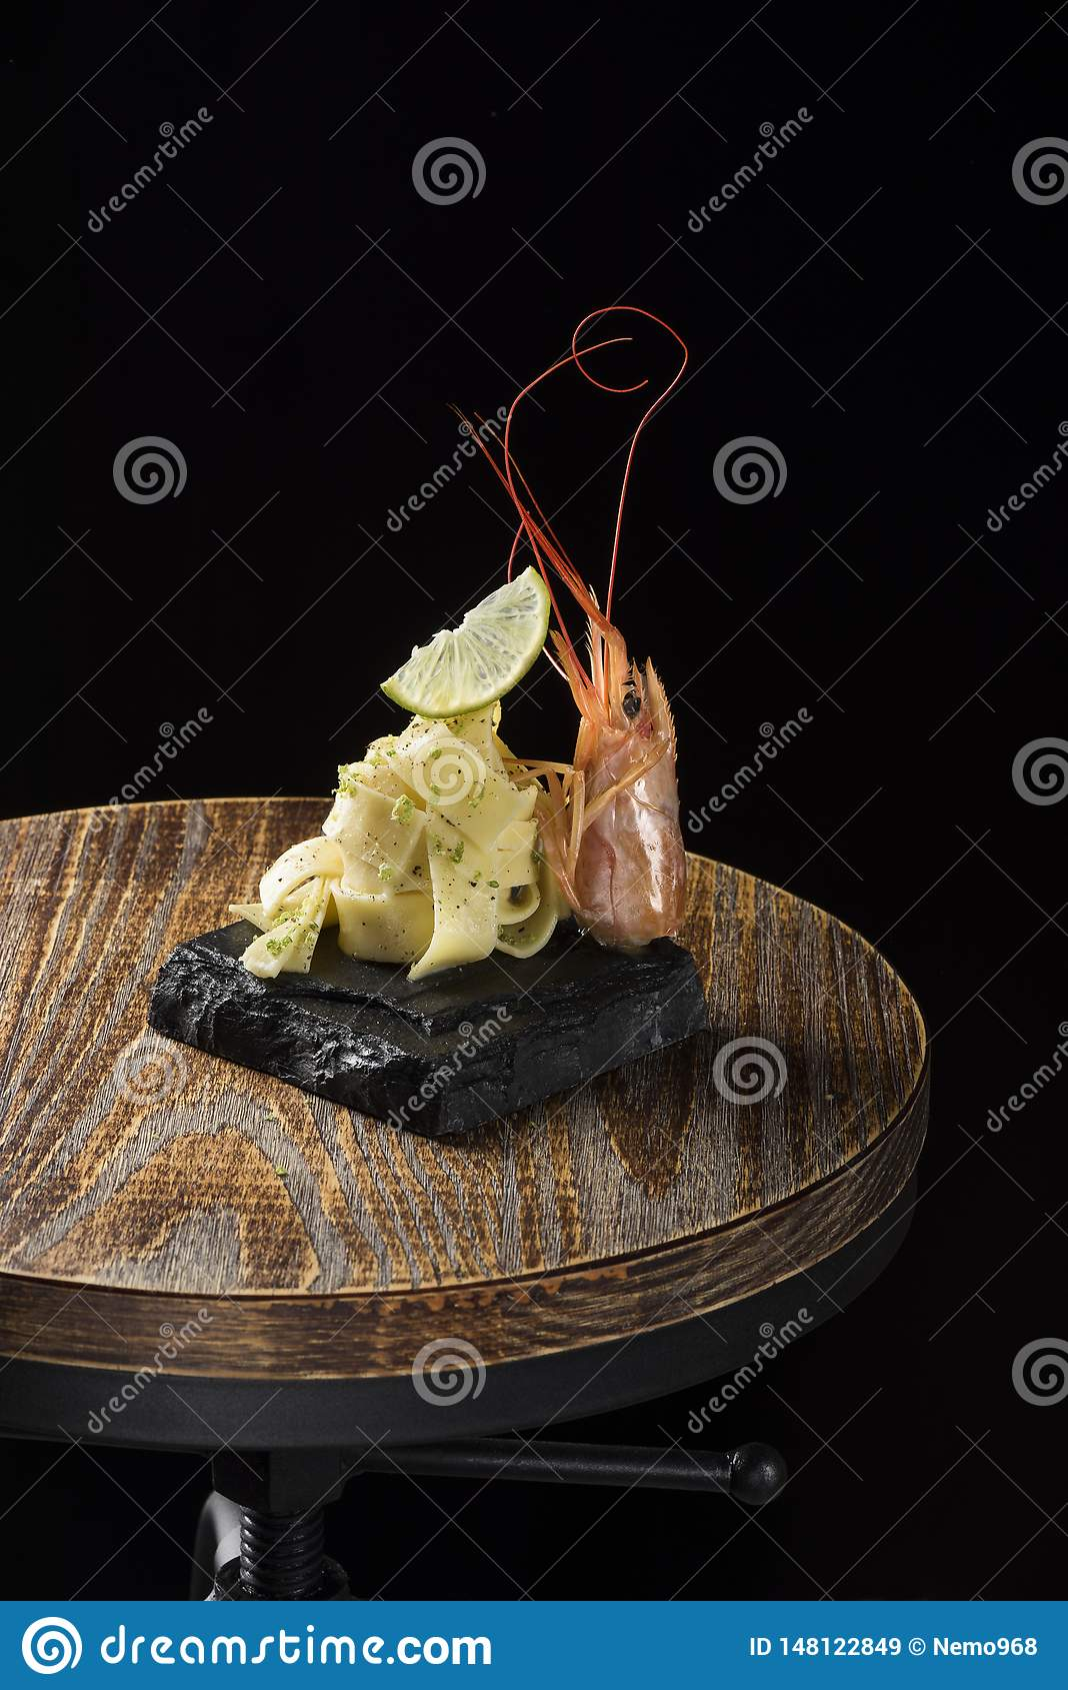 Sea carbonara with lemon and prawns on wood